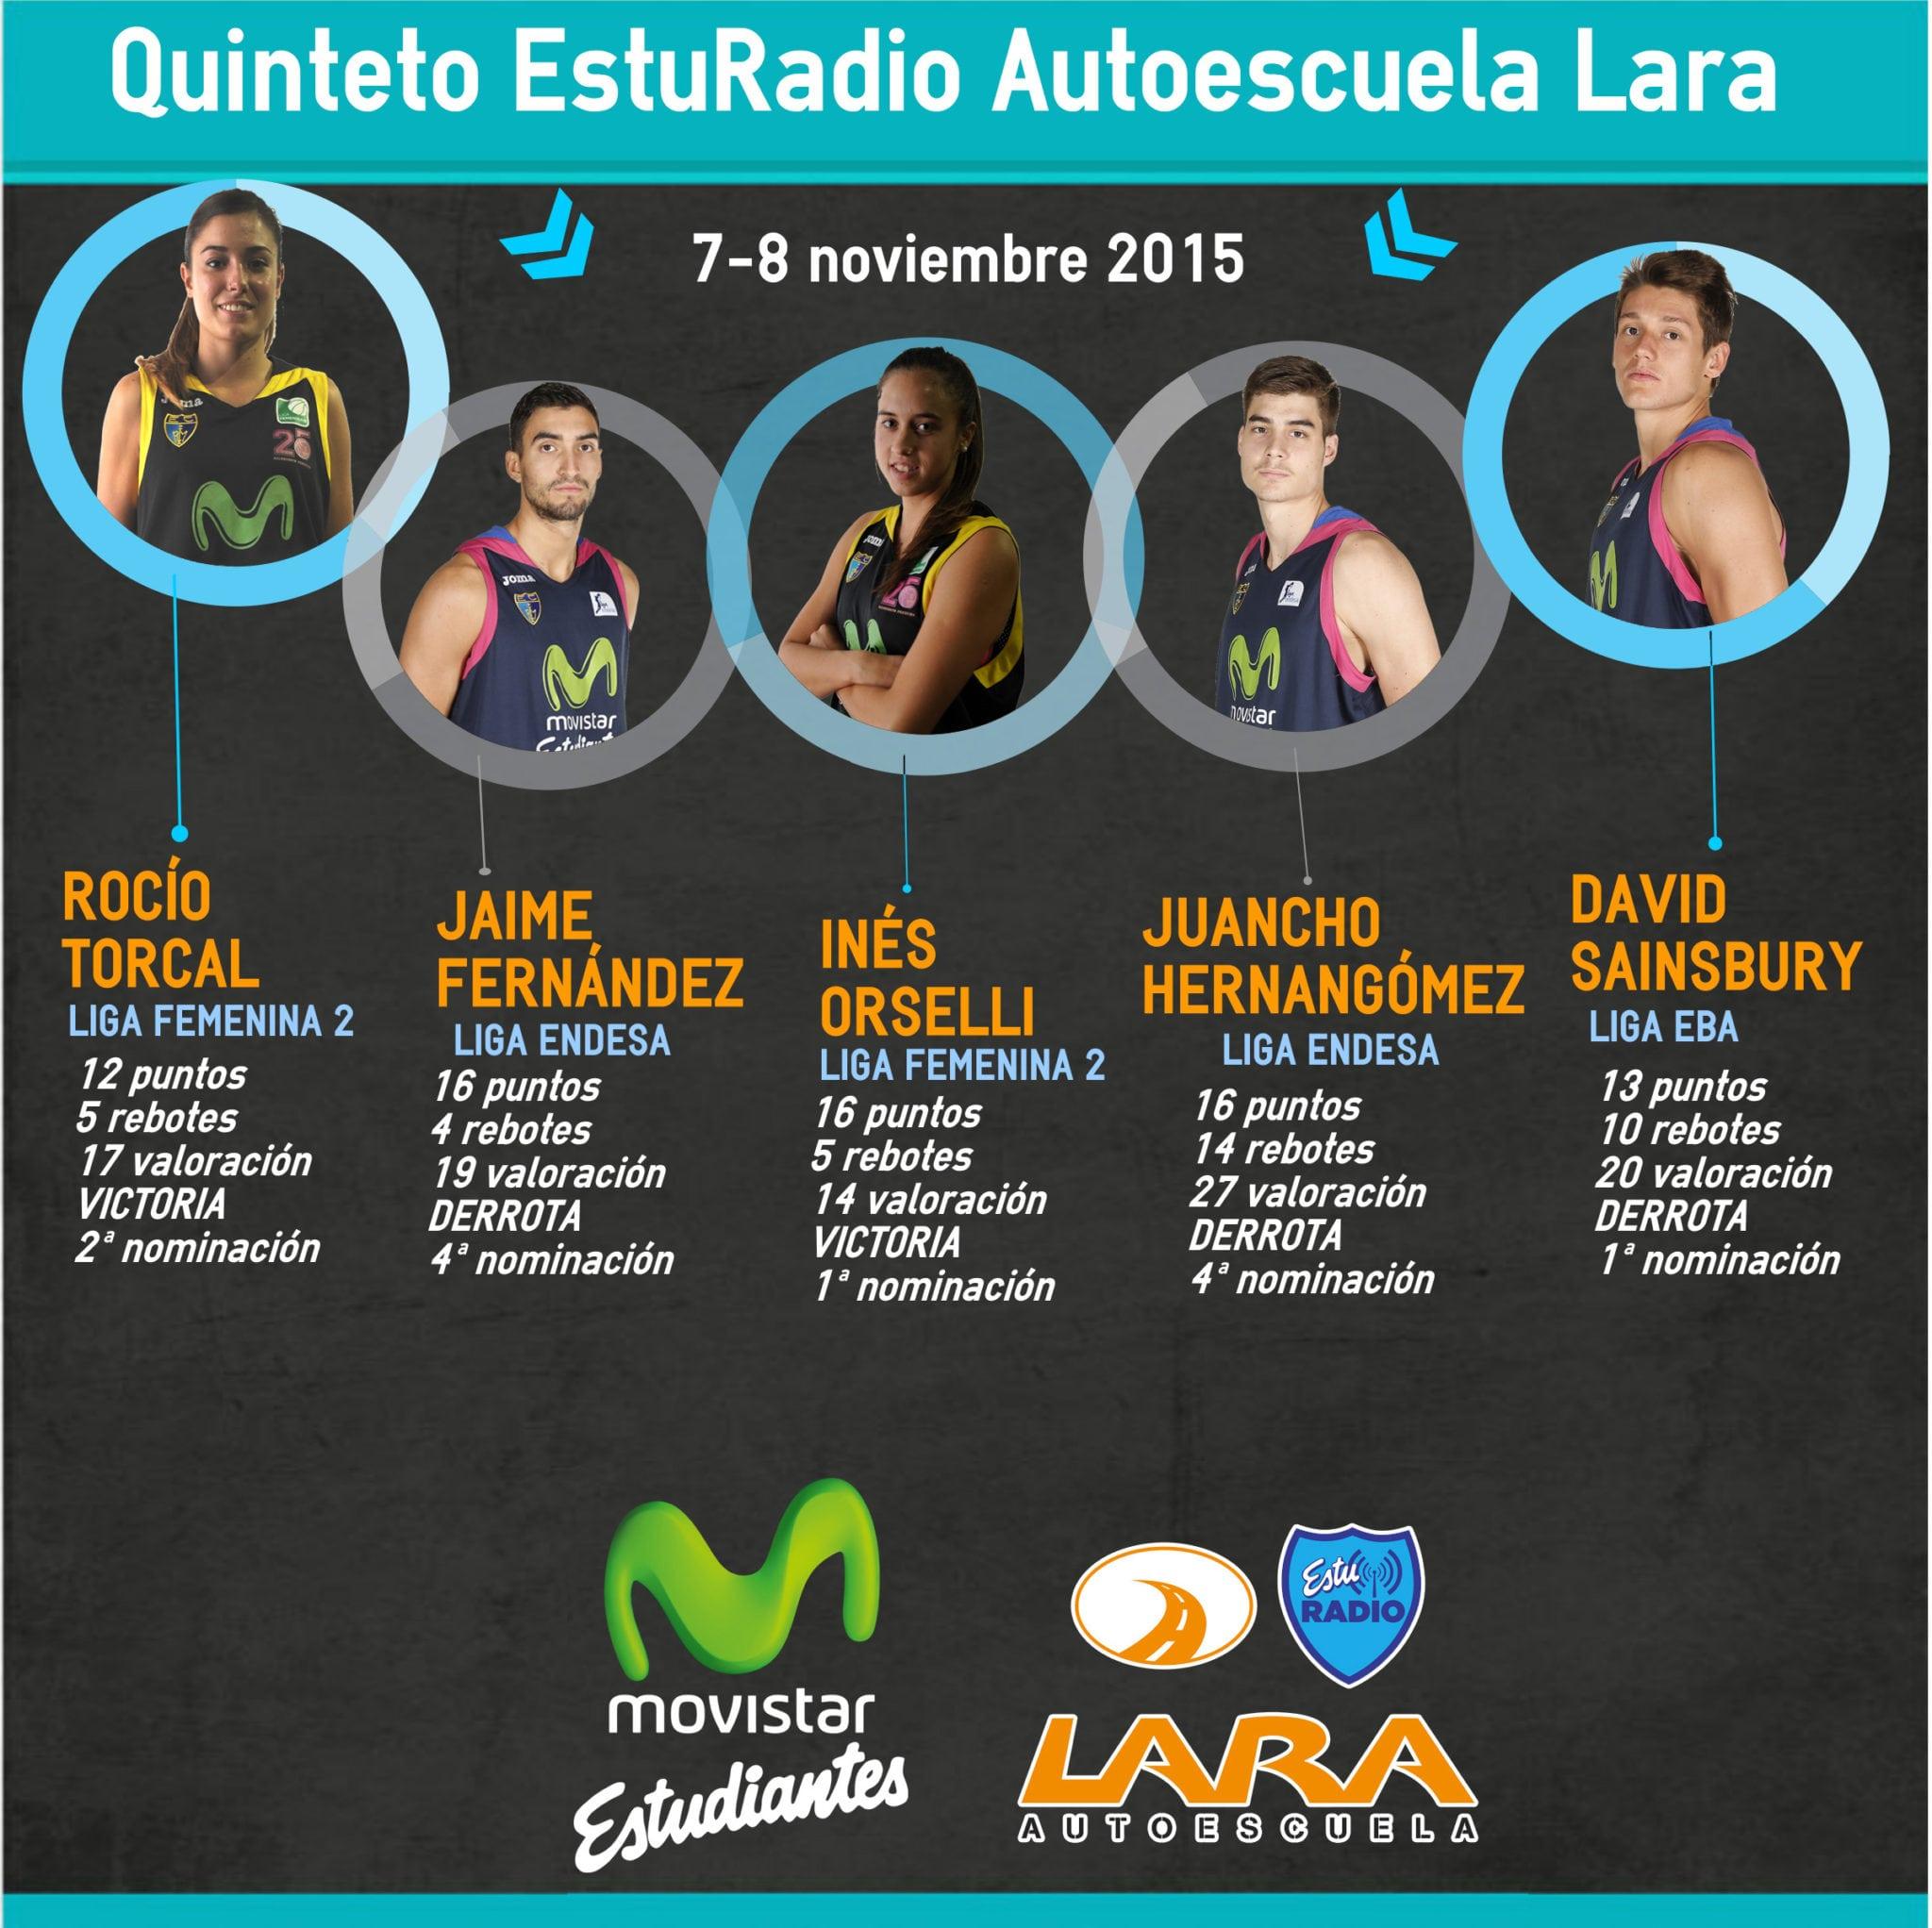 4º Quinteto EstuRadio: Torcal, Fernández, Orselli, Hernangómez y Sainsbury